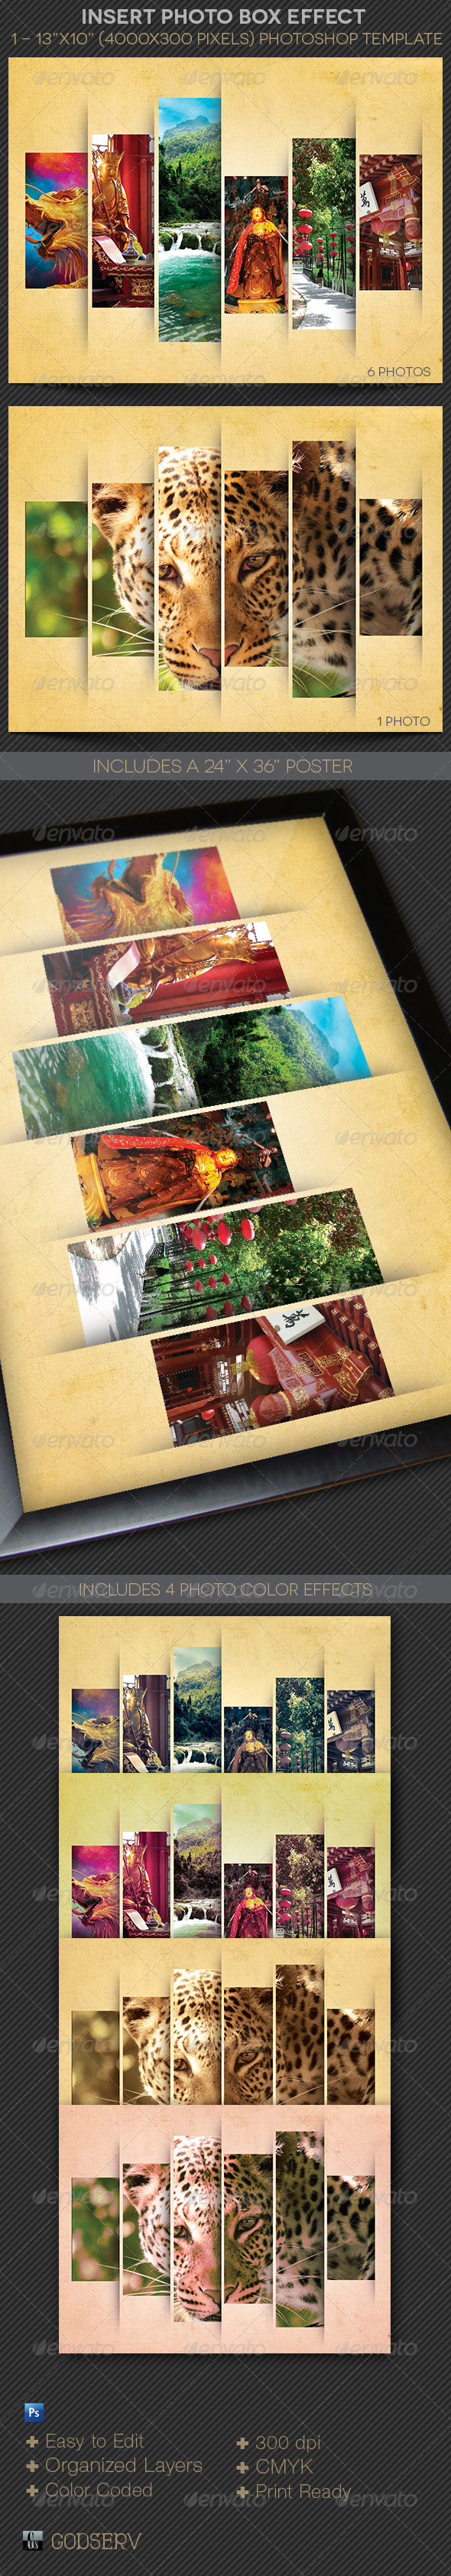 GraphicRiver Insert Photo Box Effect Template 6549285